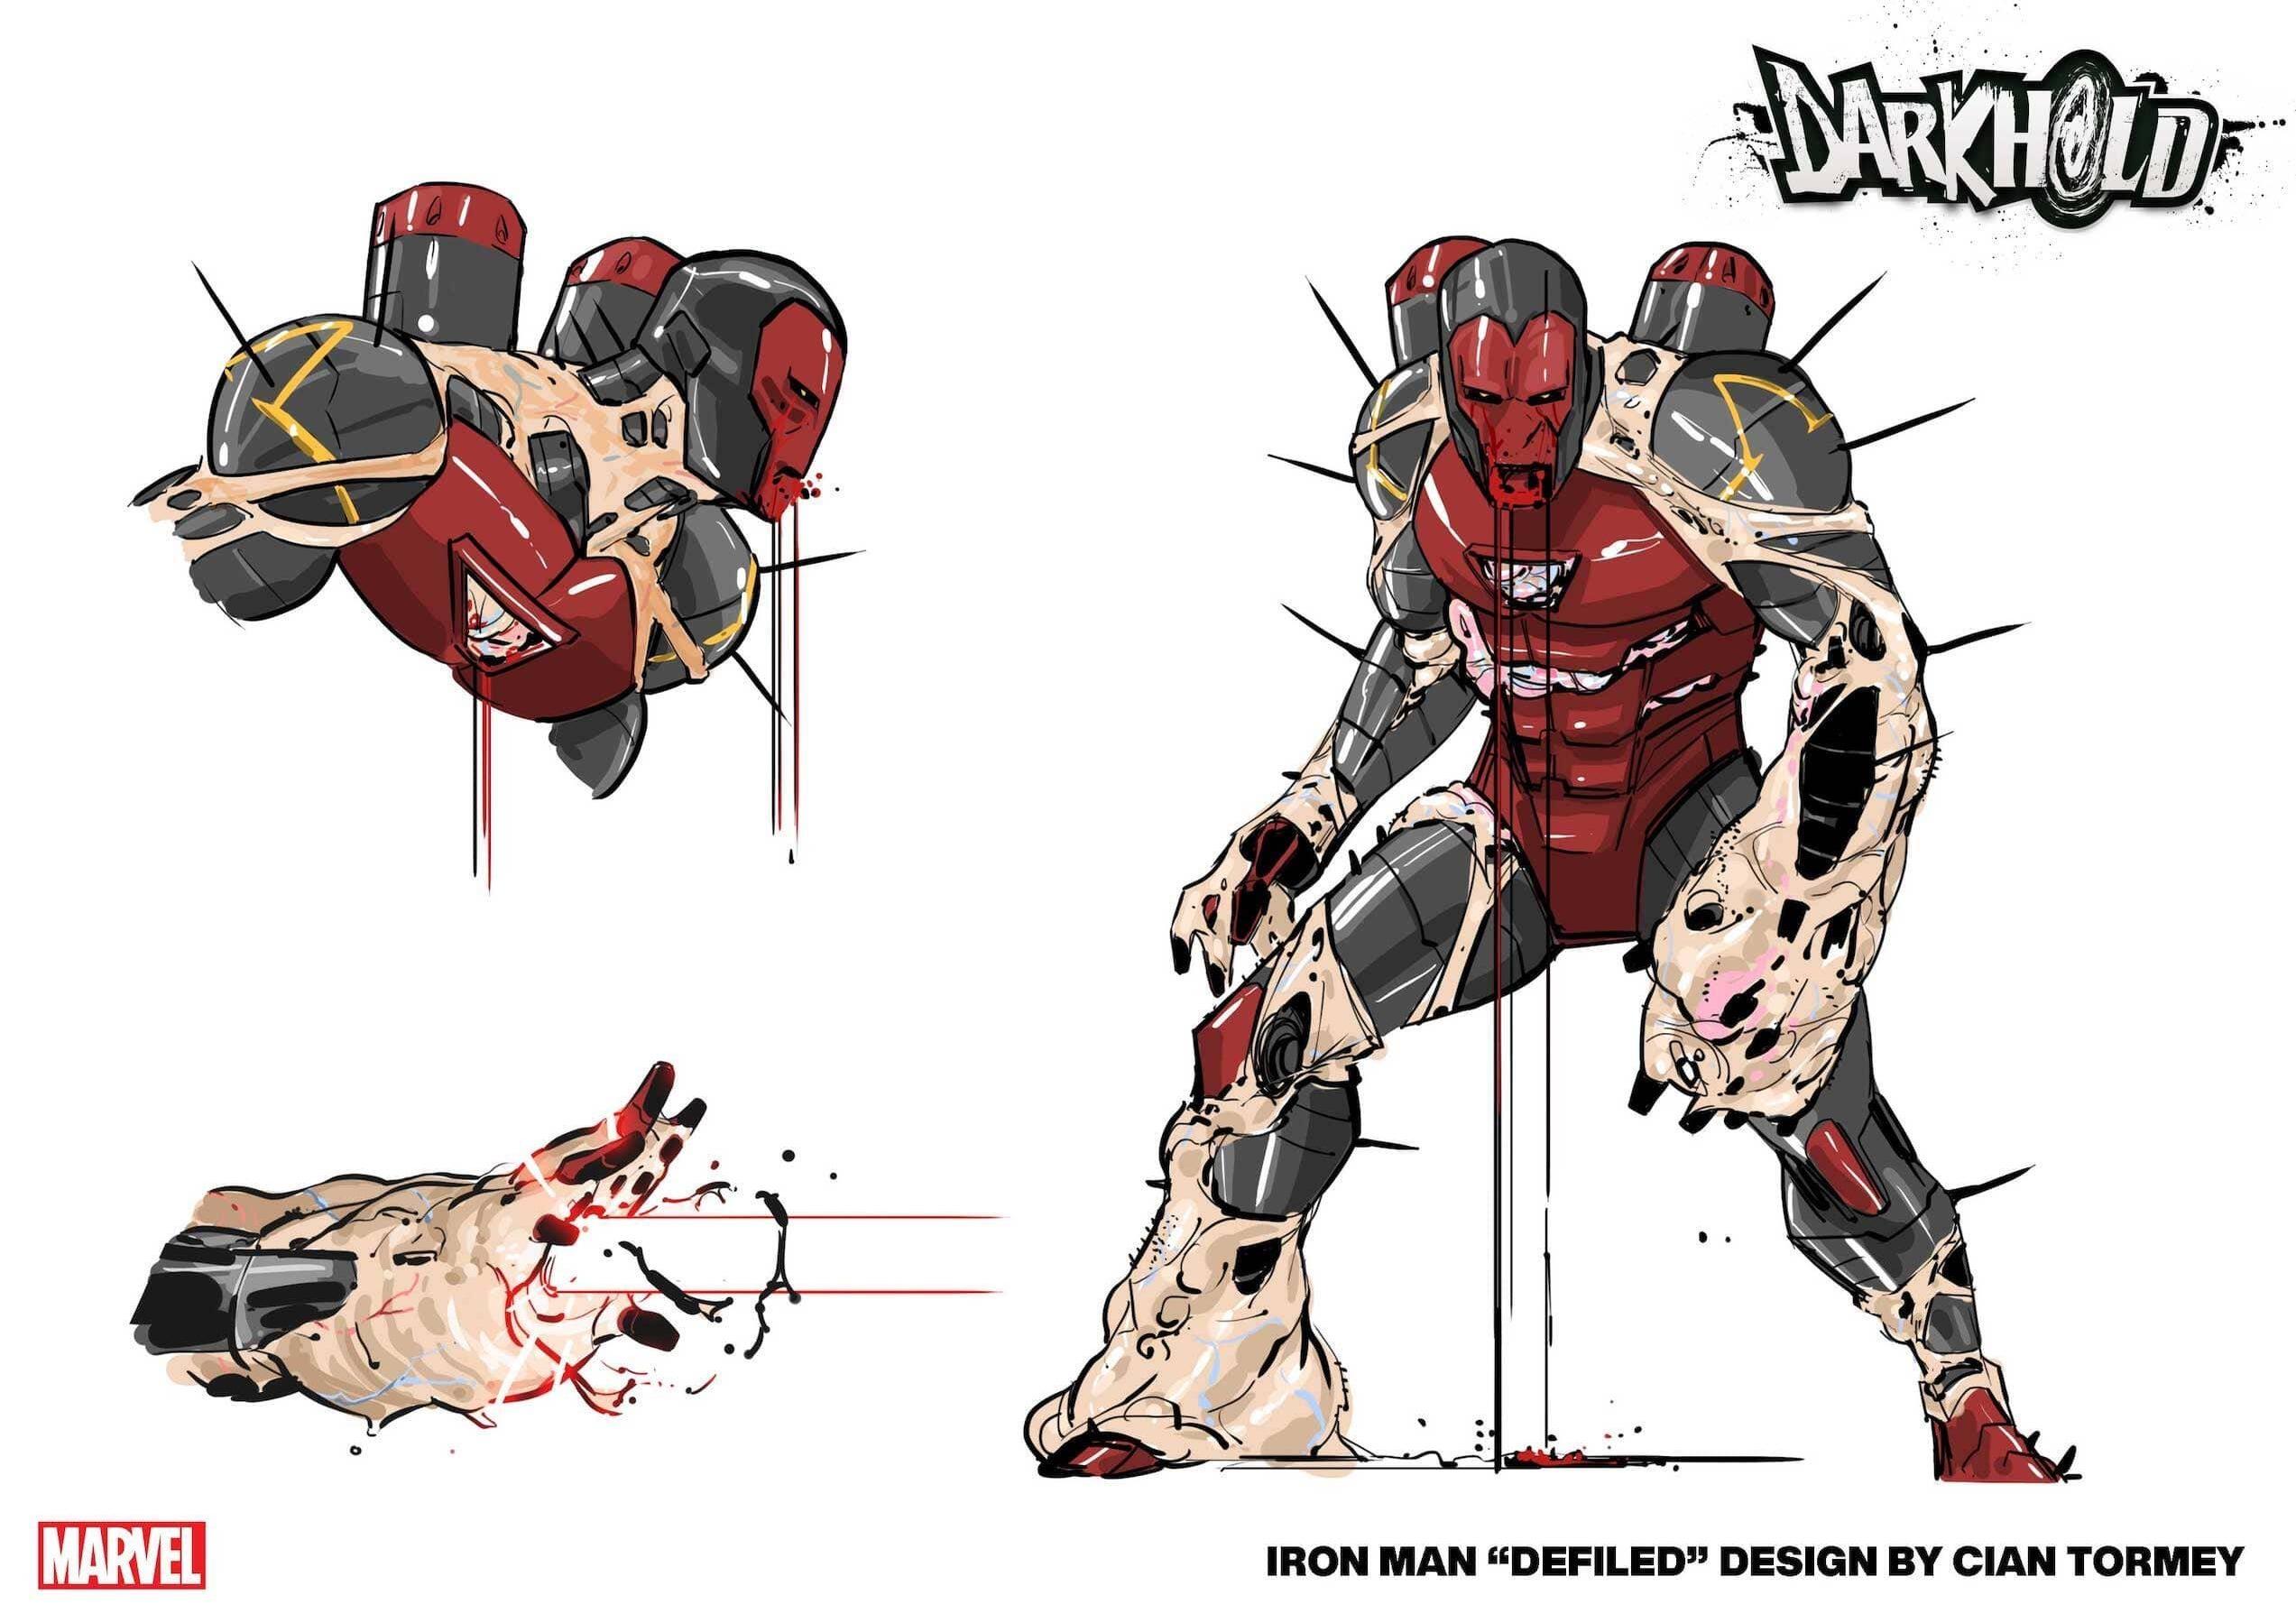 iron-man-darkhold.jpg